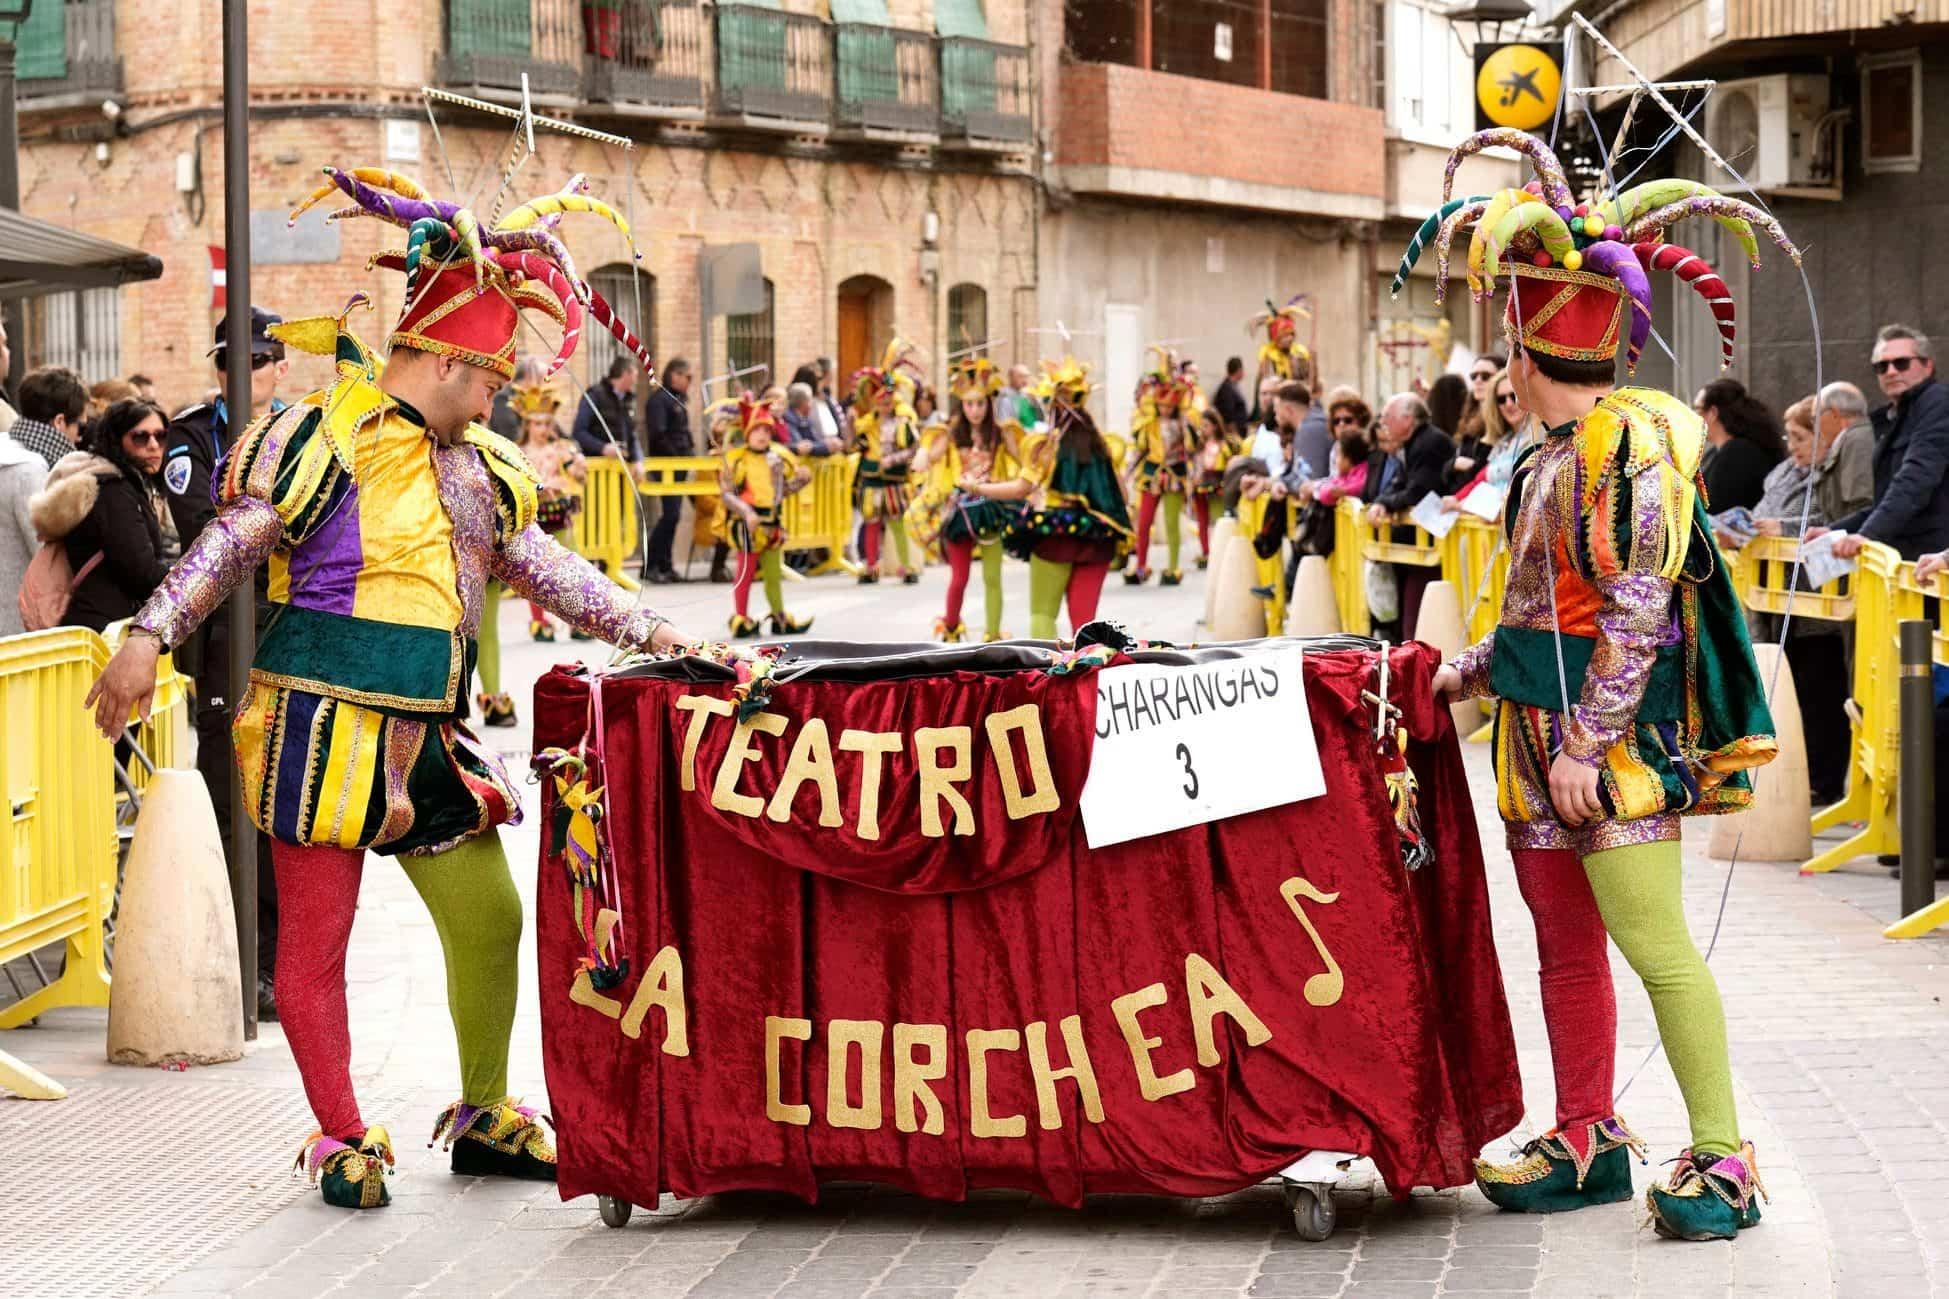 Carnaval de herencia 2020 ofertorio 31 - Selección de fotografías del Ofertorio del Carnaval de Herencia